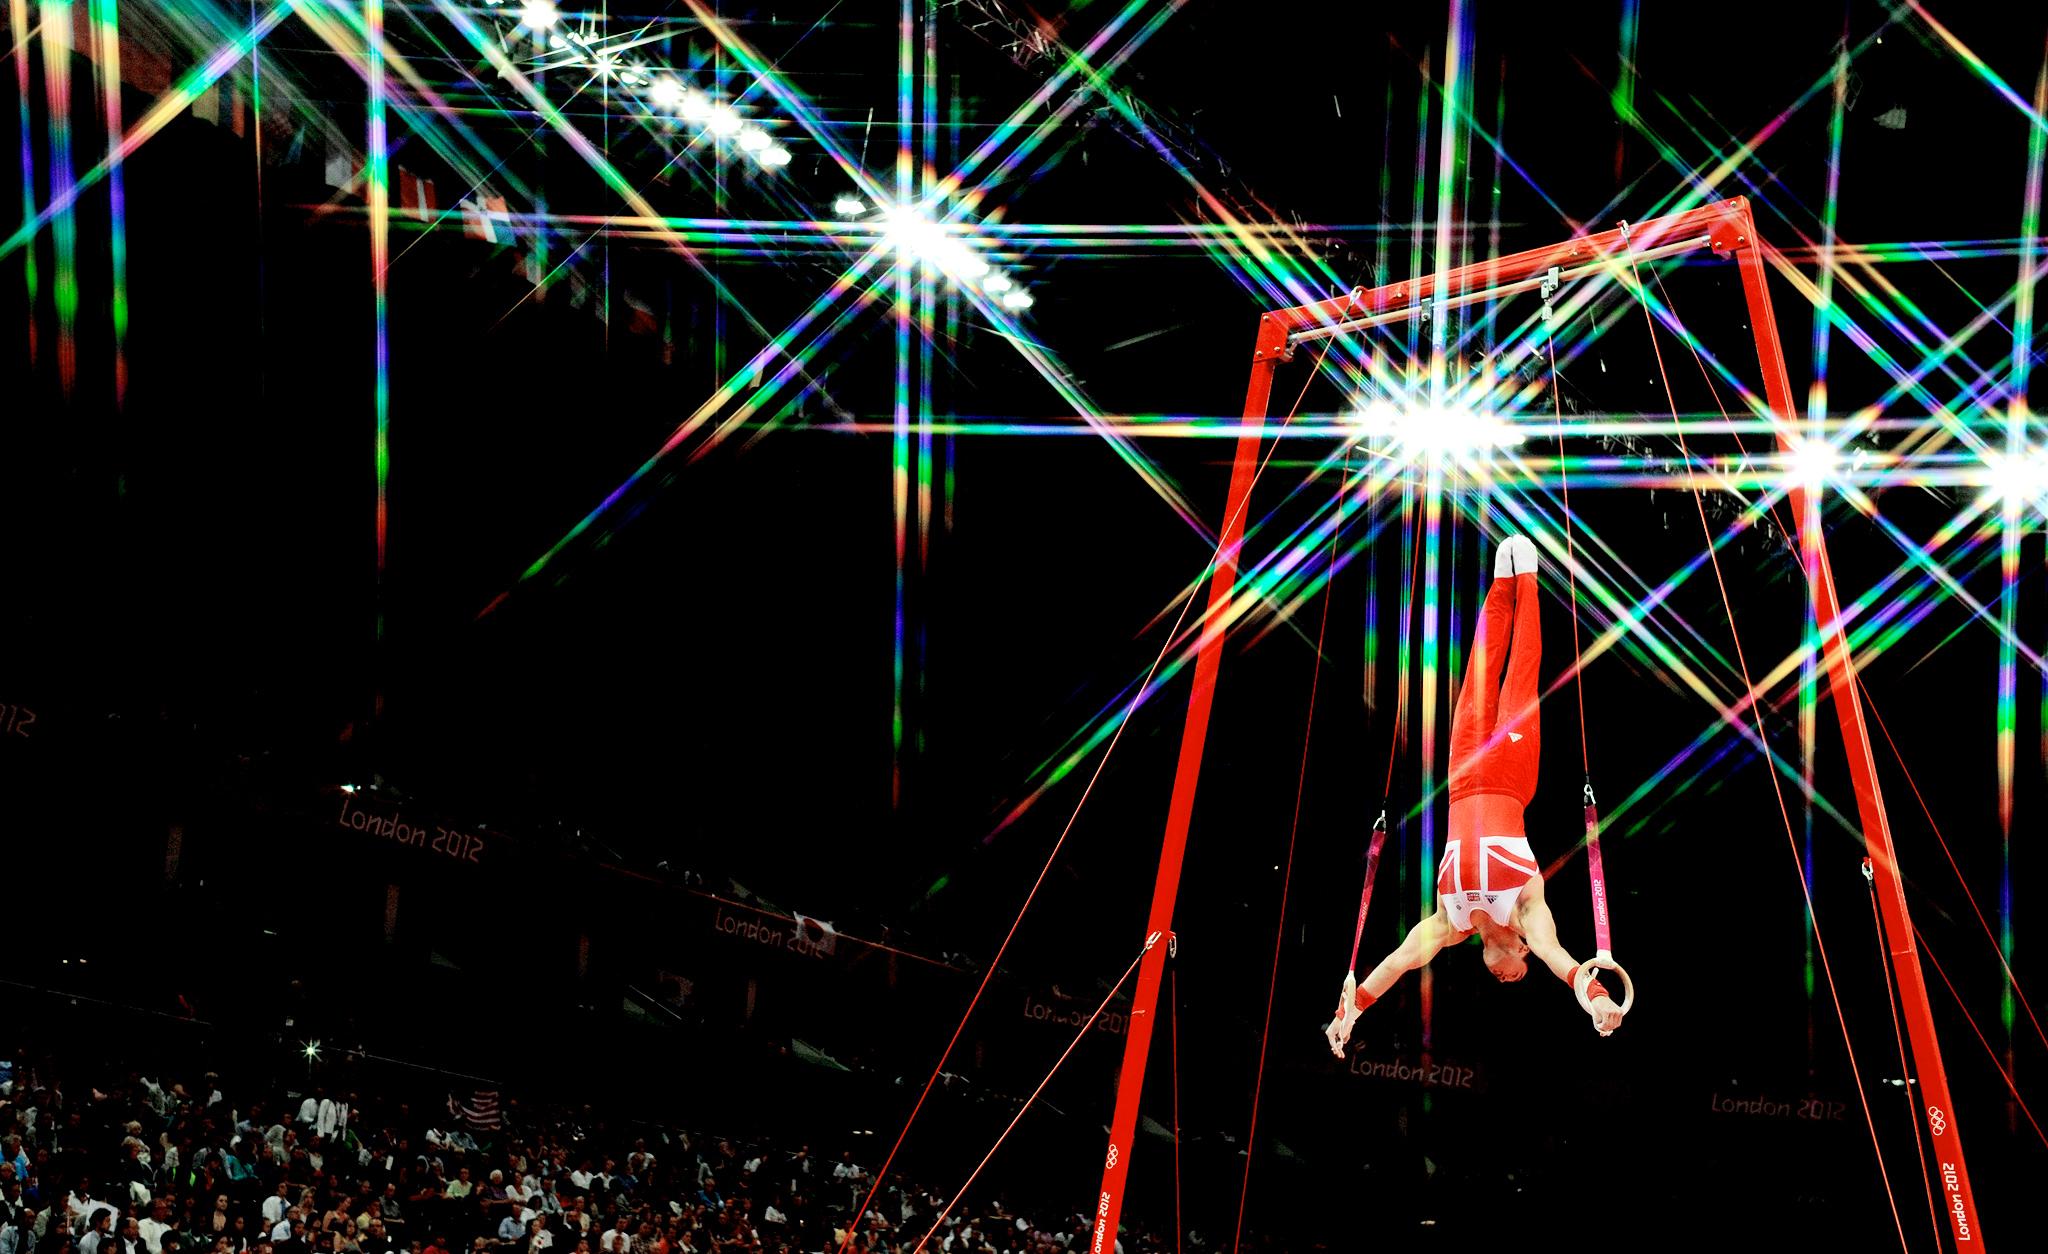 Men's Team Gymnastics Artistic